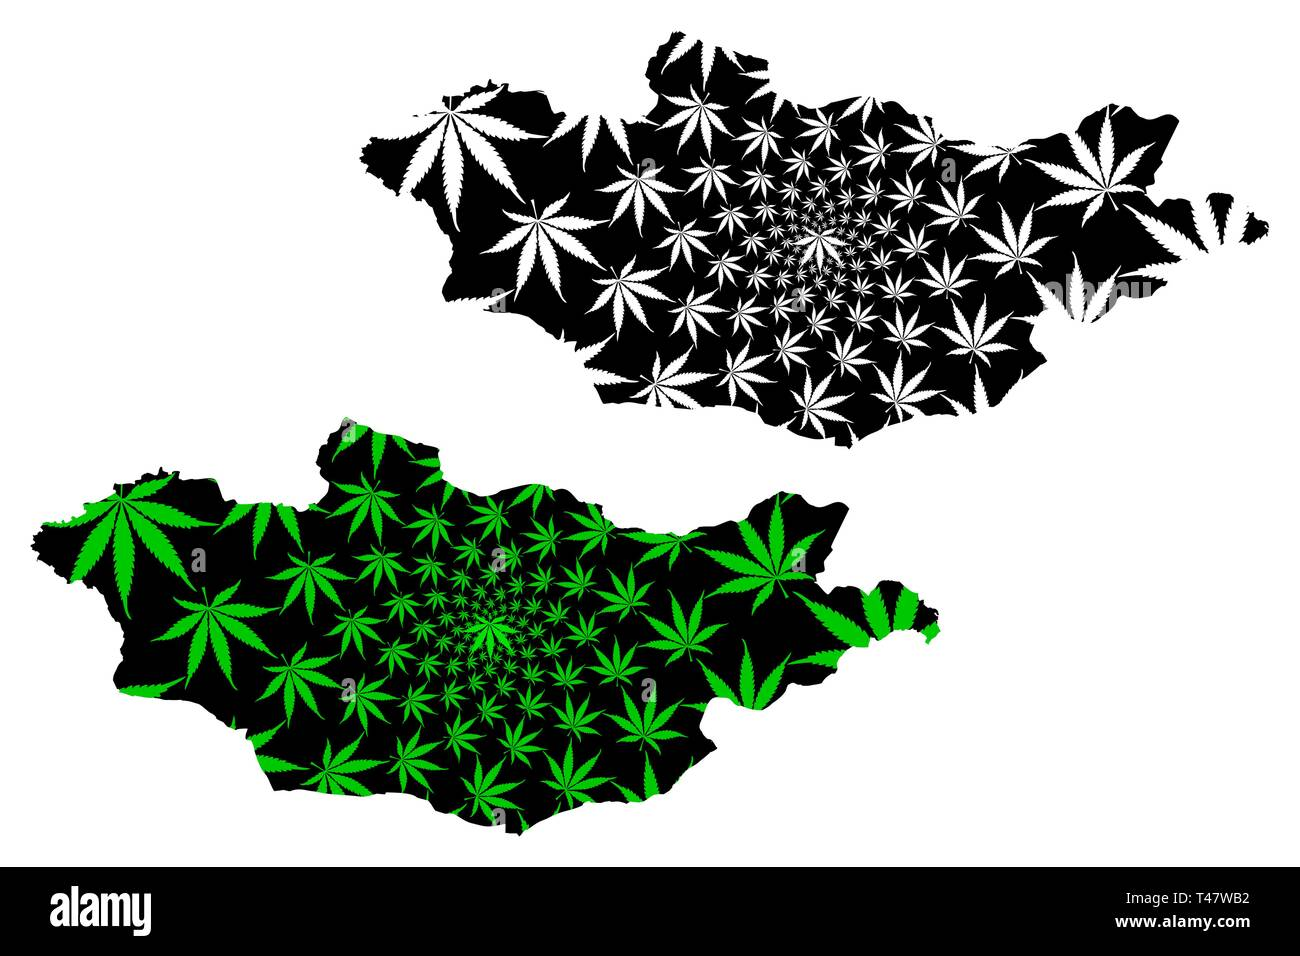 Mongolia - map is designed cannabis leaf green and black, Mongolia map made of marijuana (marihuana,THC) foliage, - Stock Image